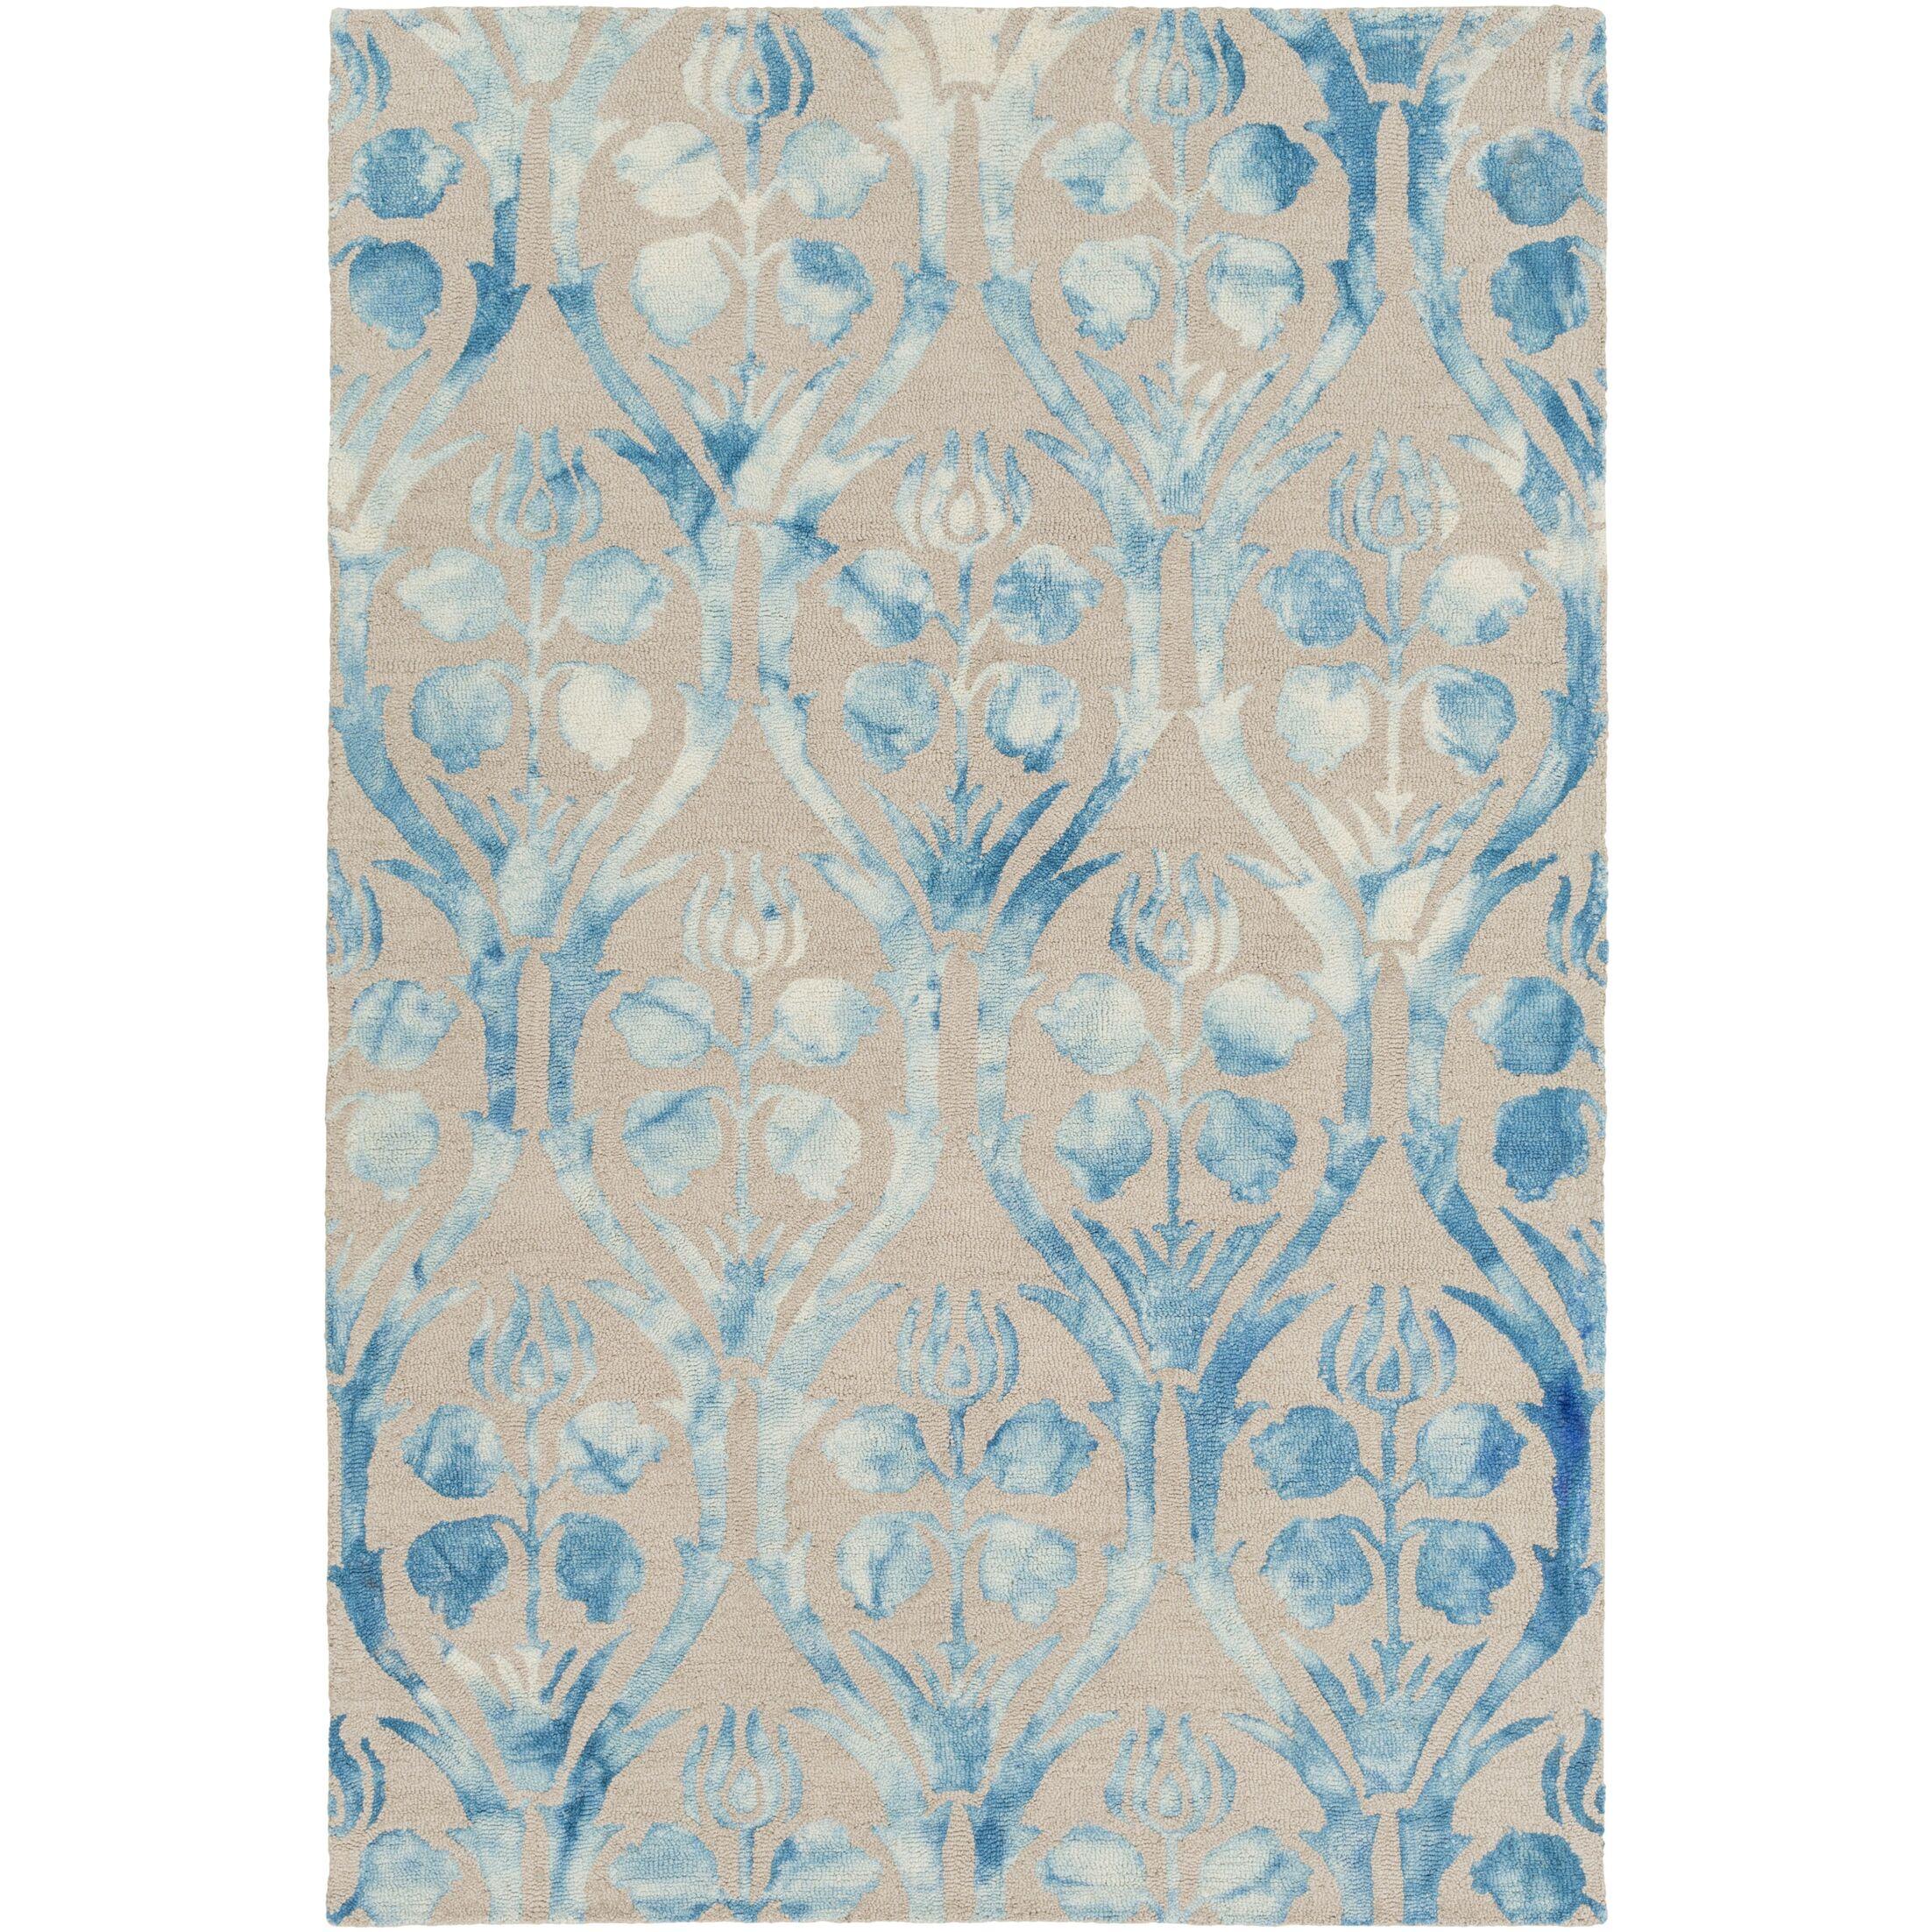 Baconton Hand-Hooked Blue/Beige Area Rug Rug Size: Rectangle 6' x 9'